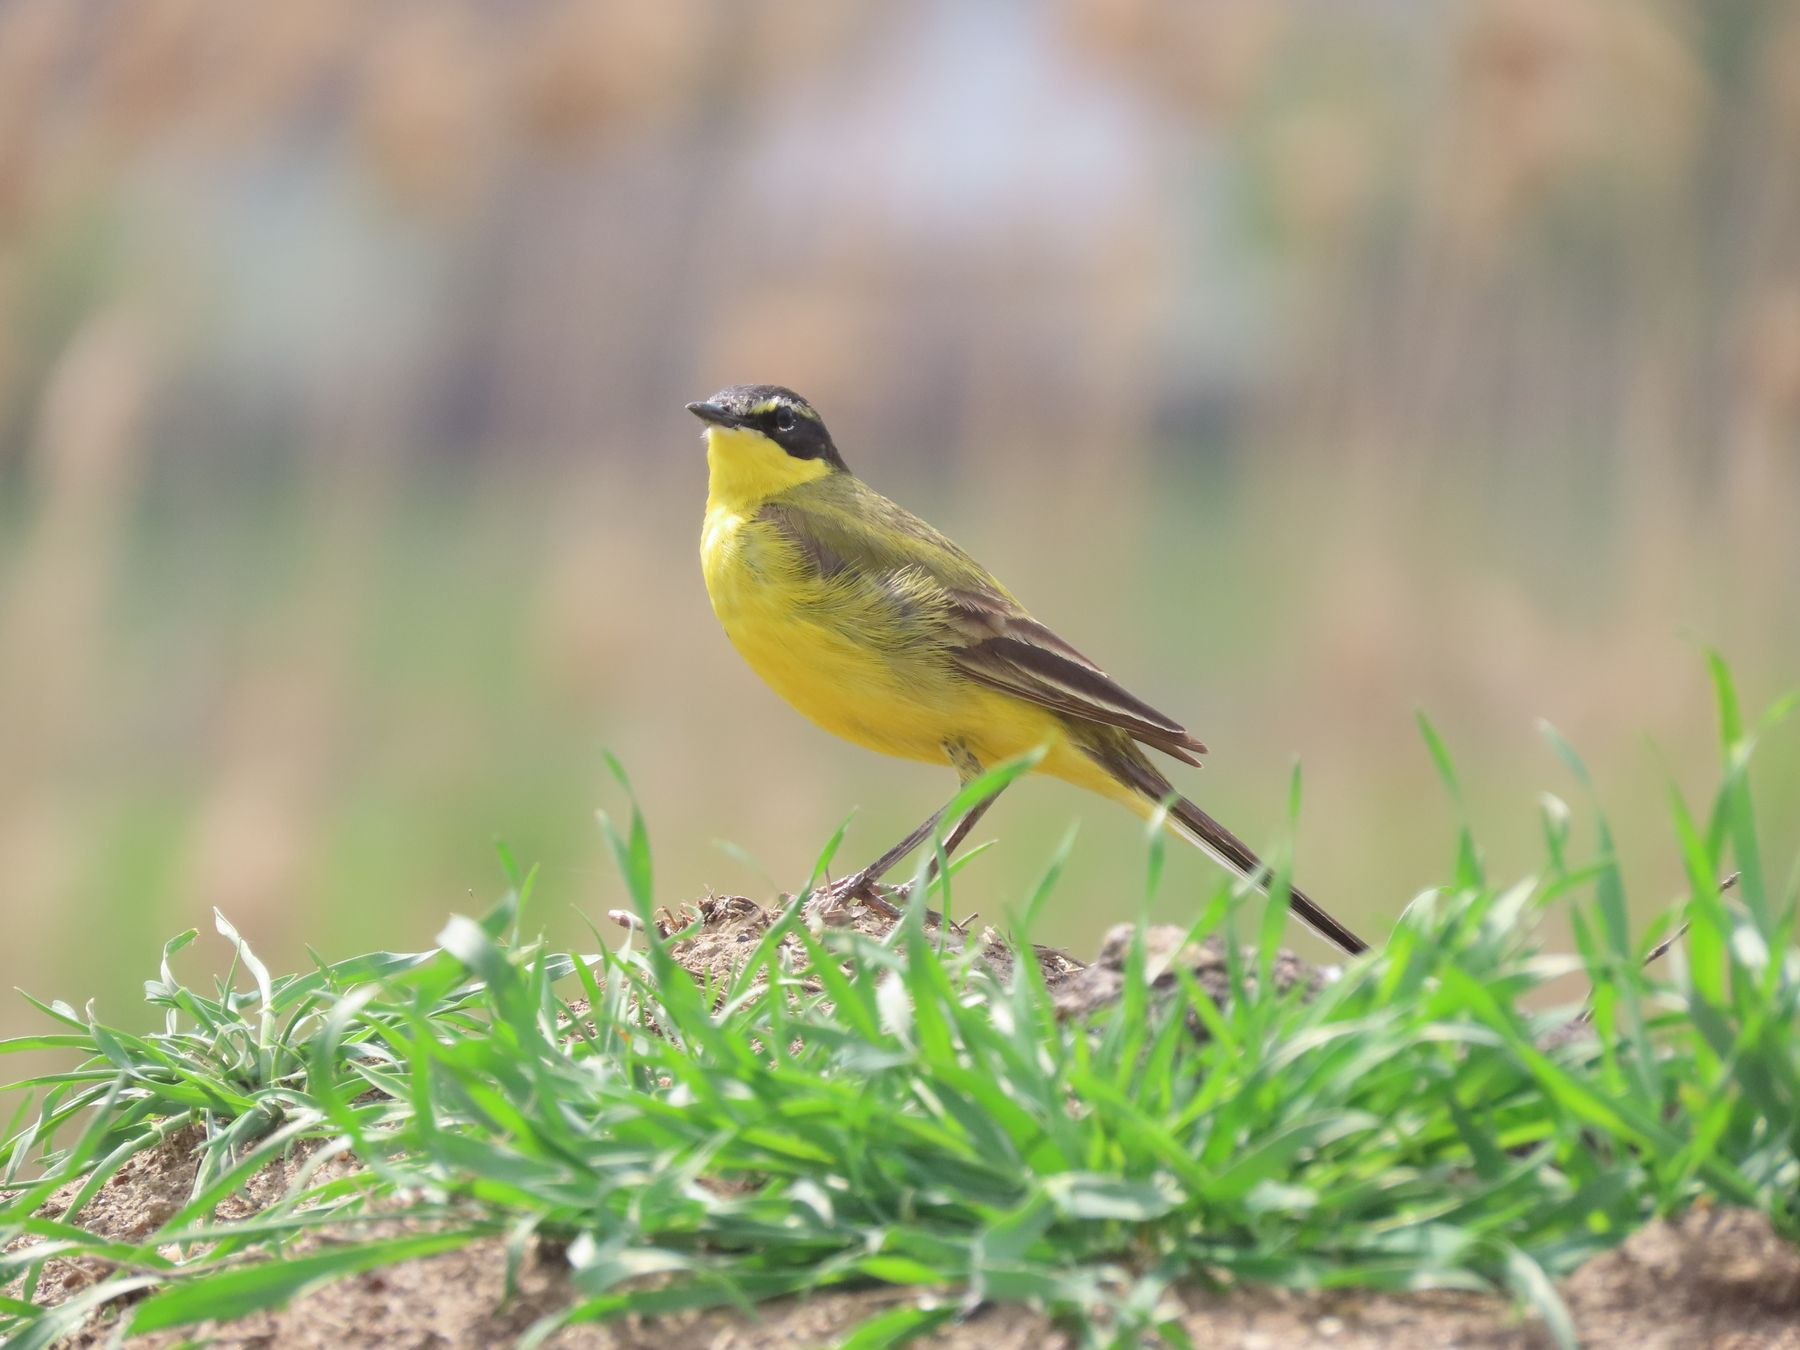 Жёлтая трясогузка, или плиска (лат. Motacilla flava) птицы трясогузка